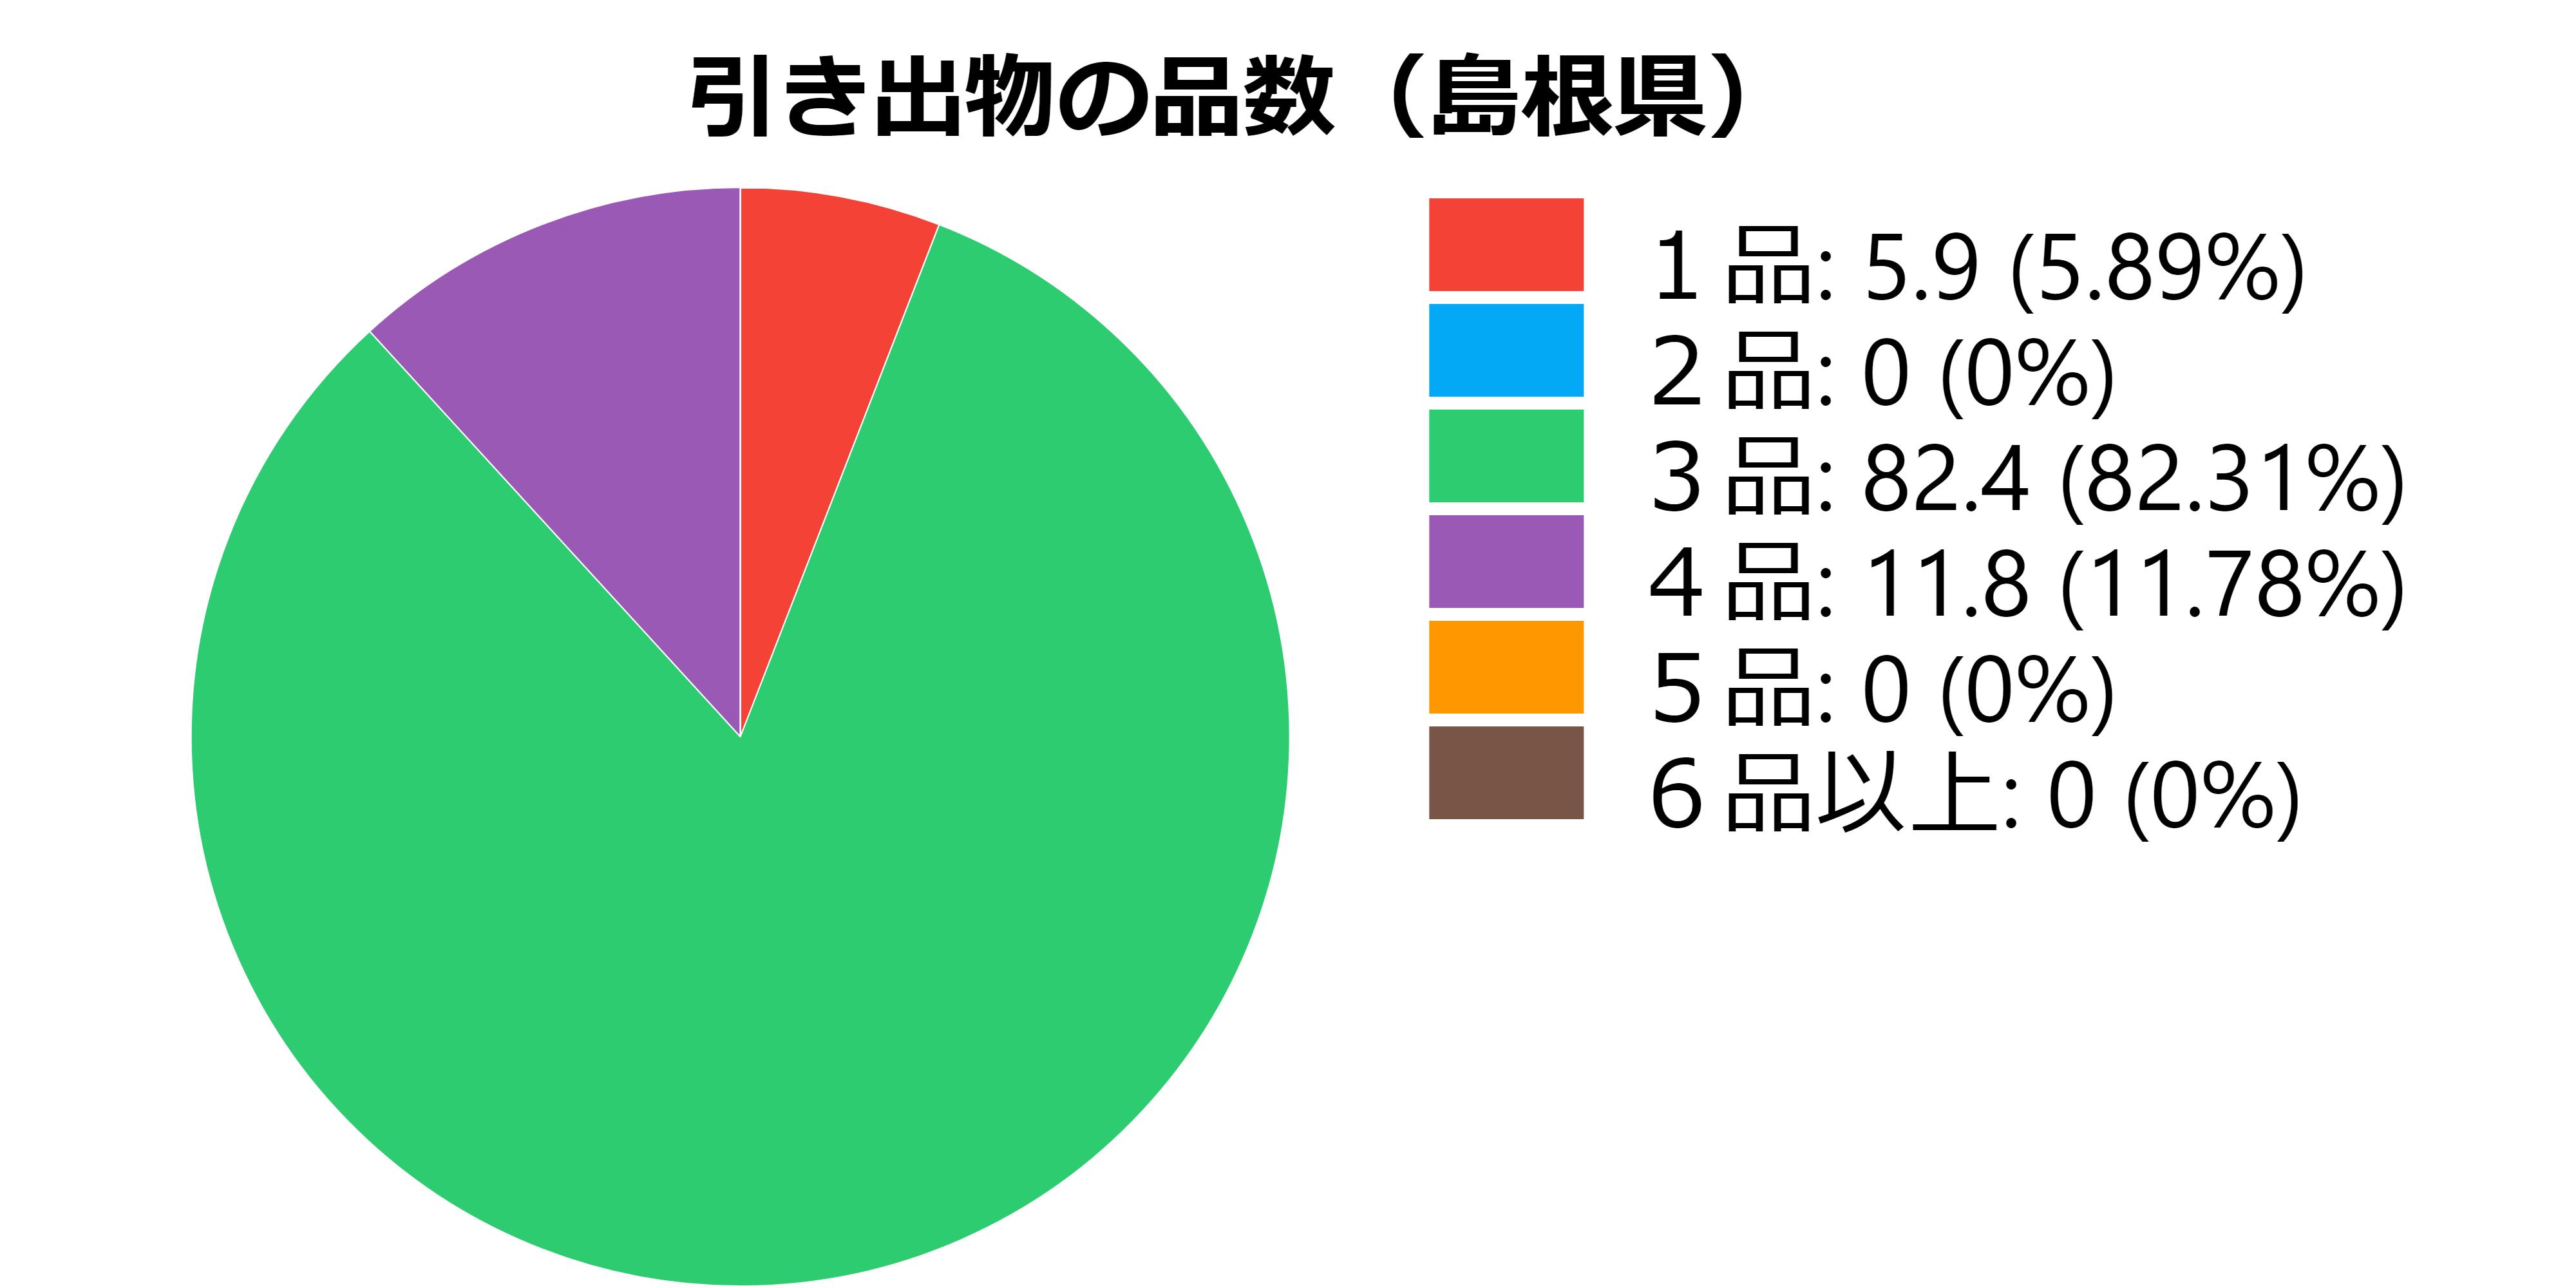 品数(島根県)